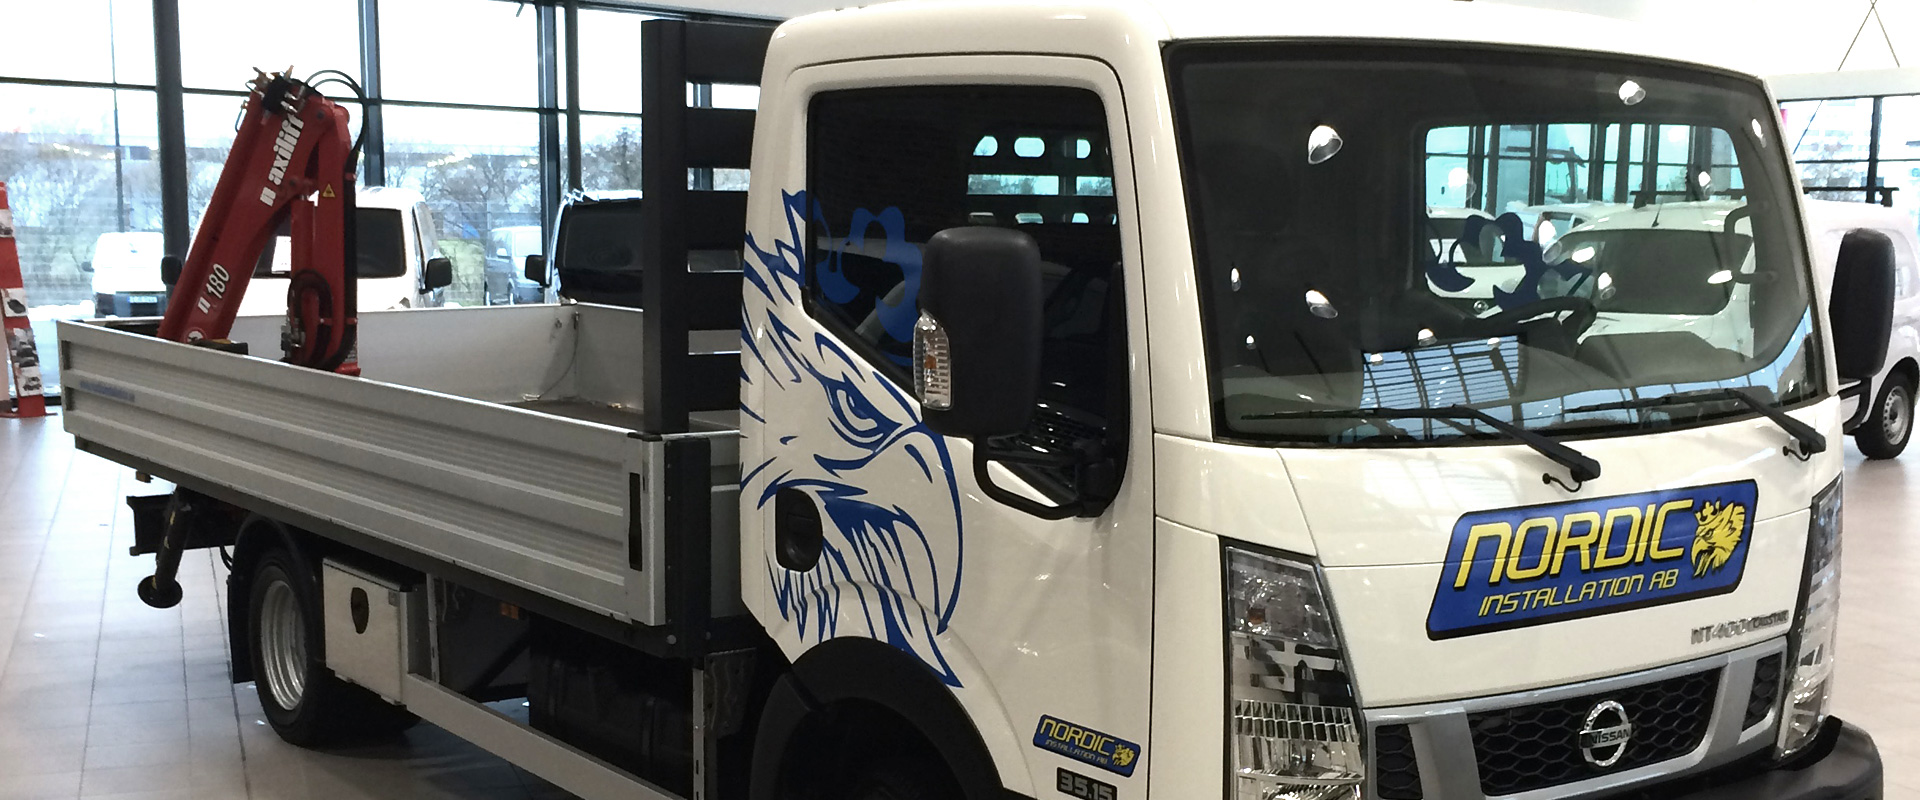 New crane truck